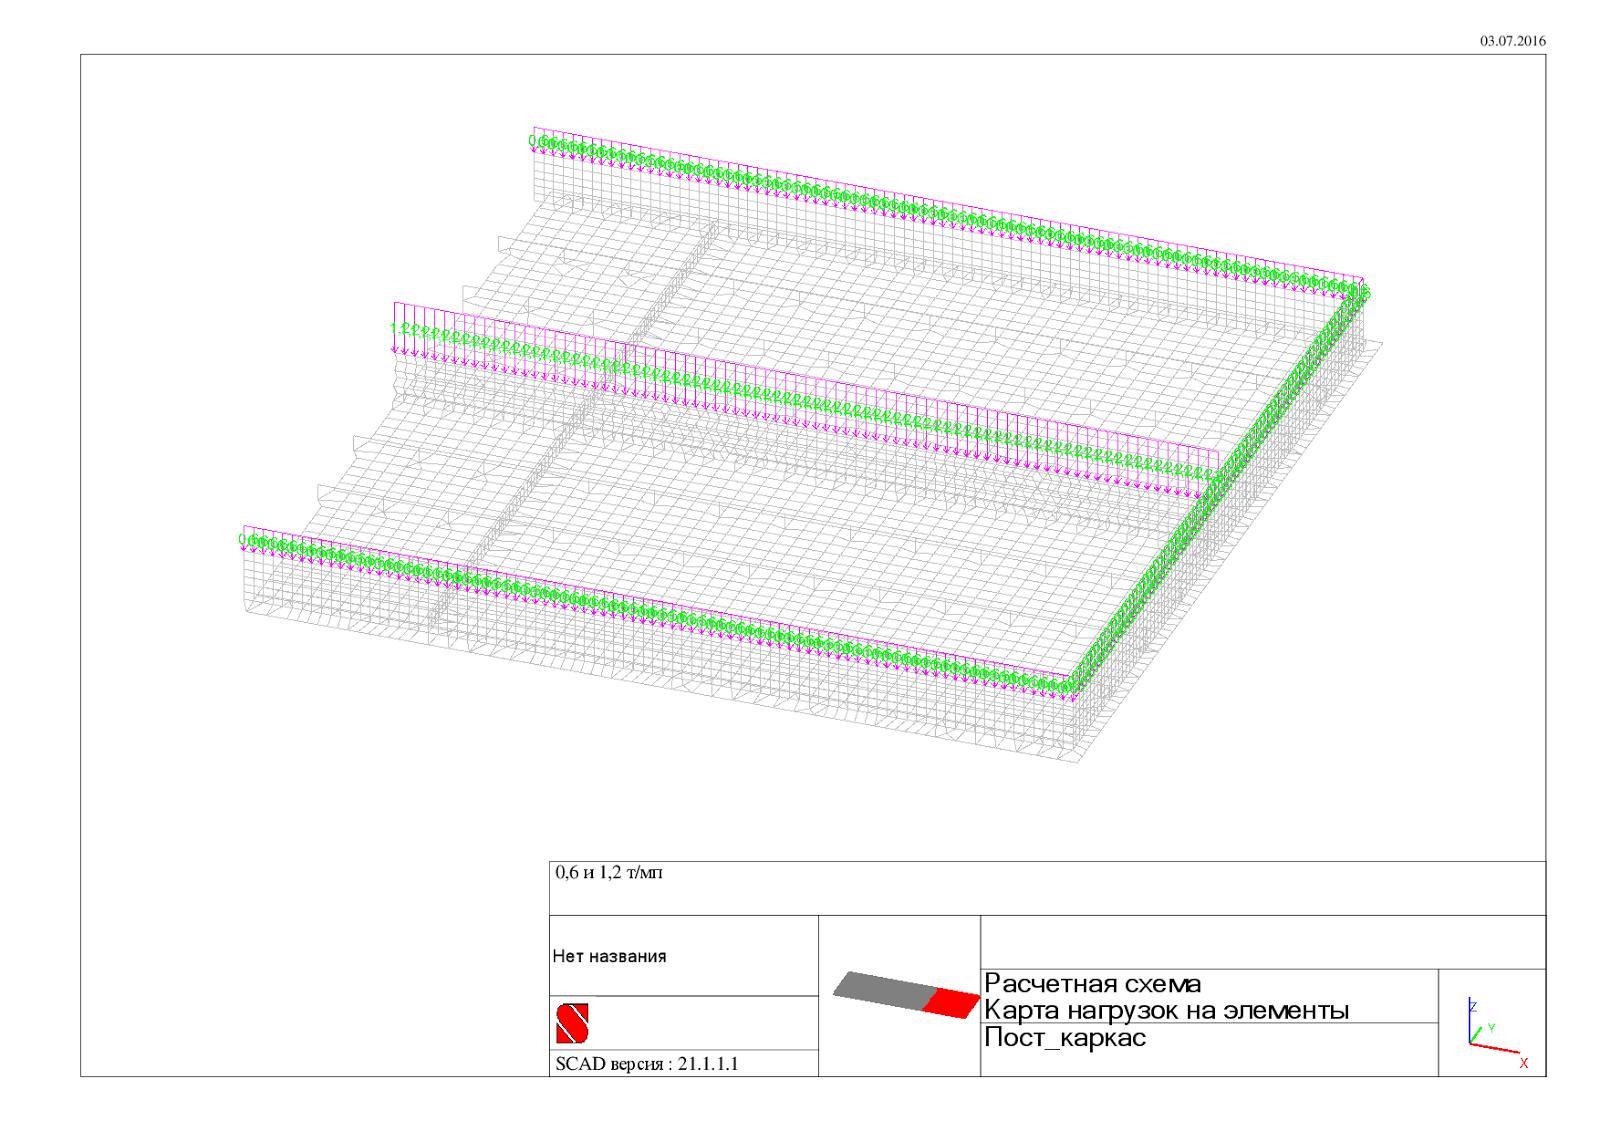 калькулятор толщины фундаментной плиты